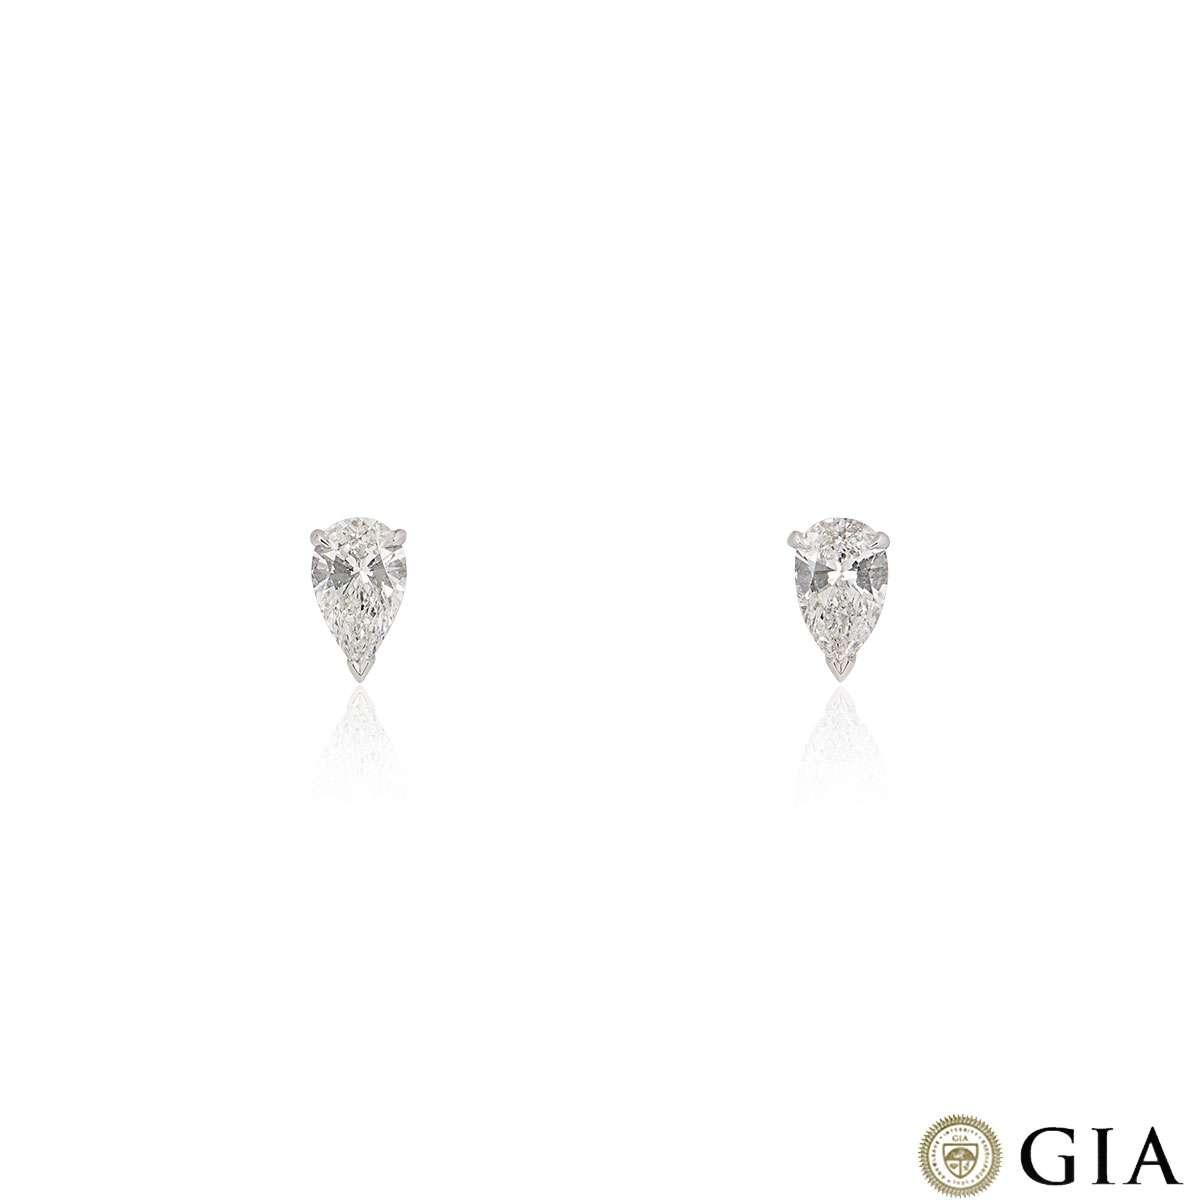 White Gold Pear Cut Diamond Earrings 2.38ct TDW